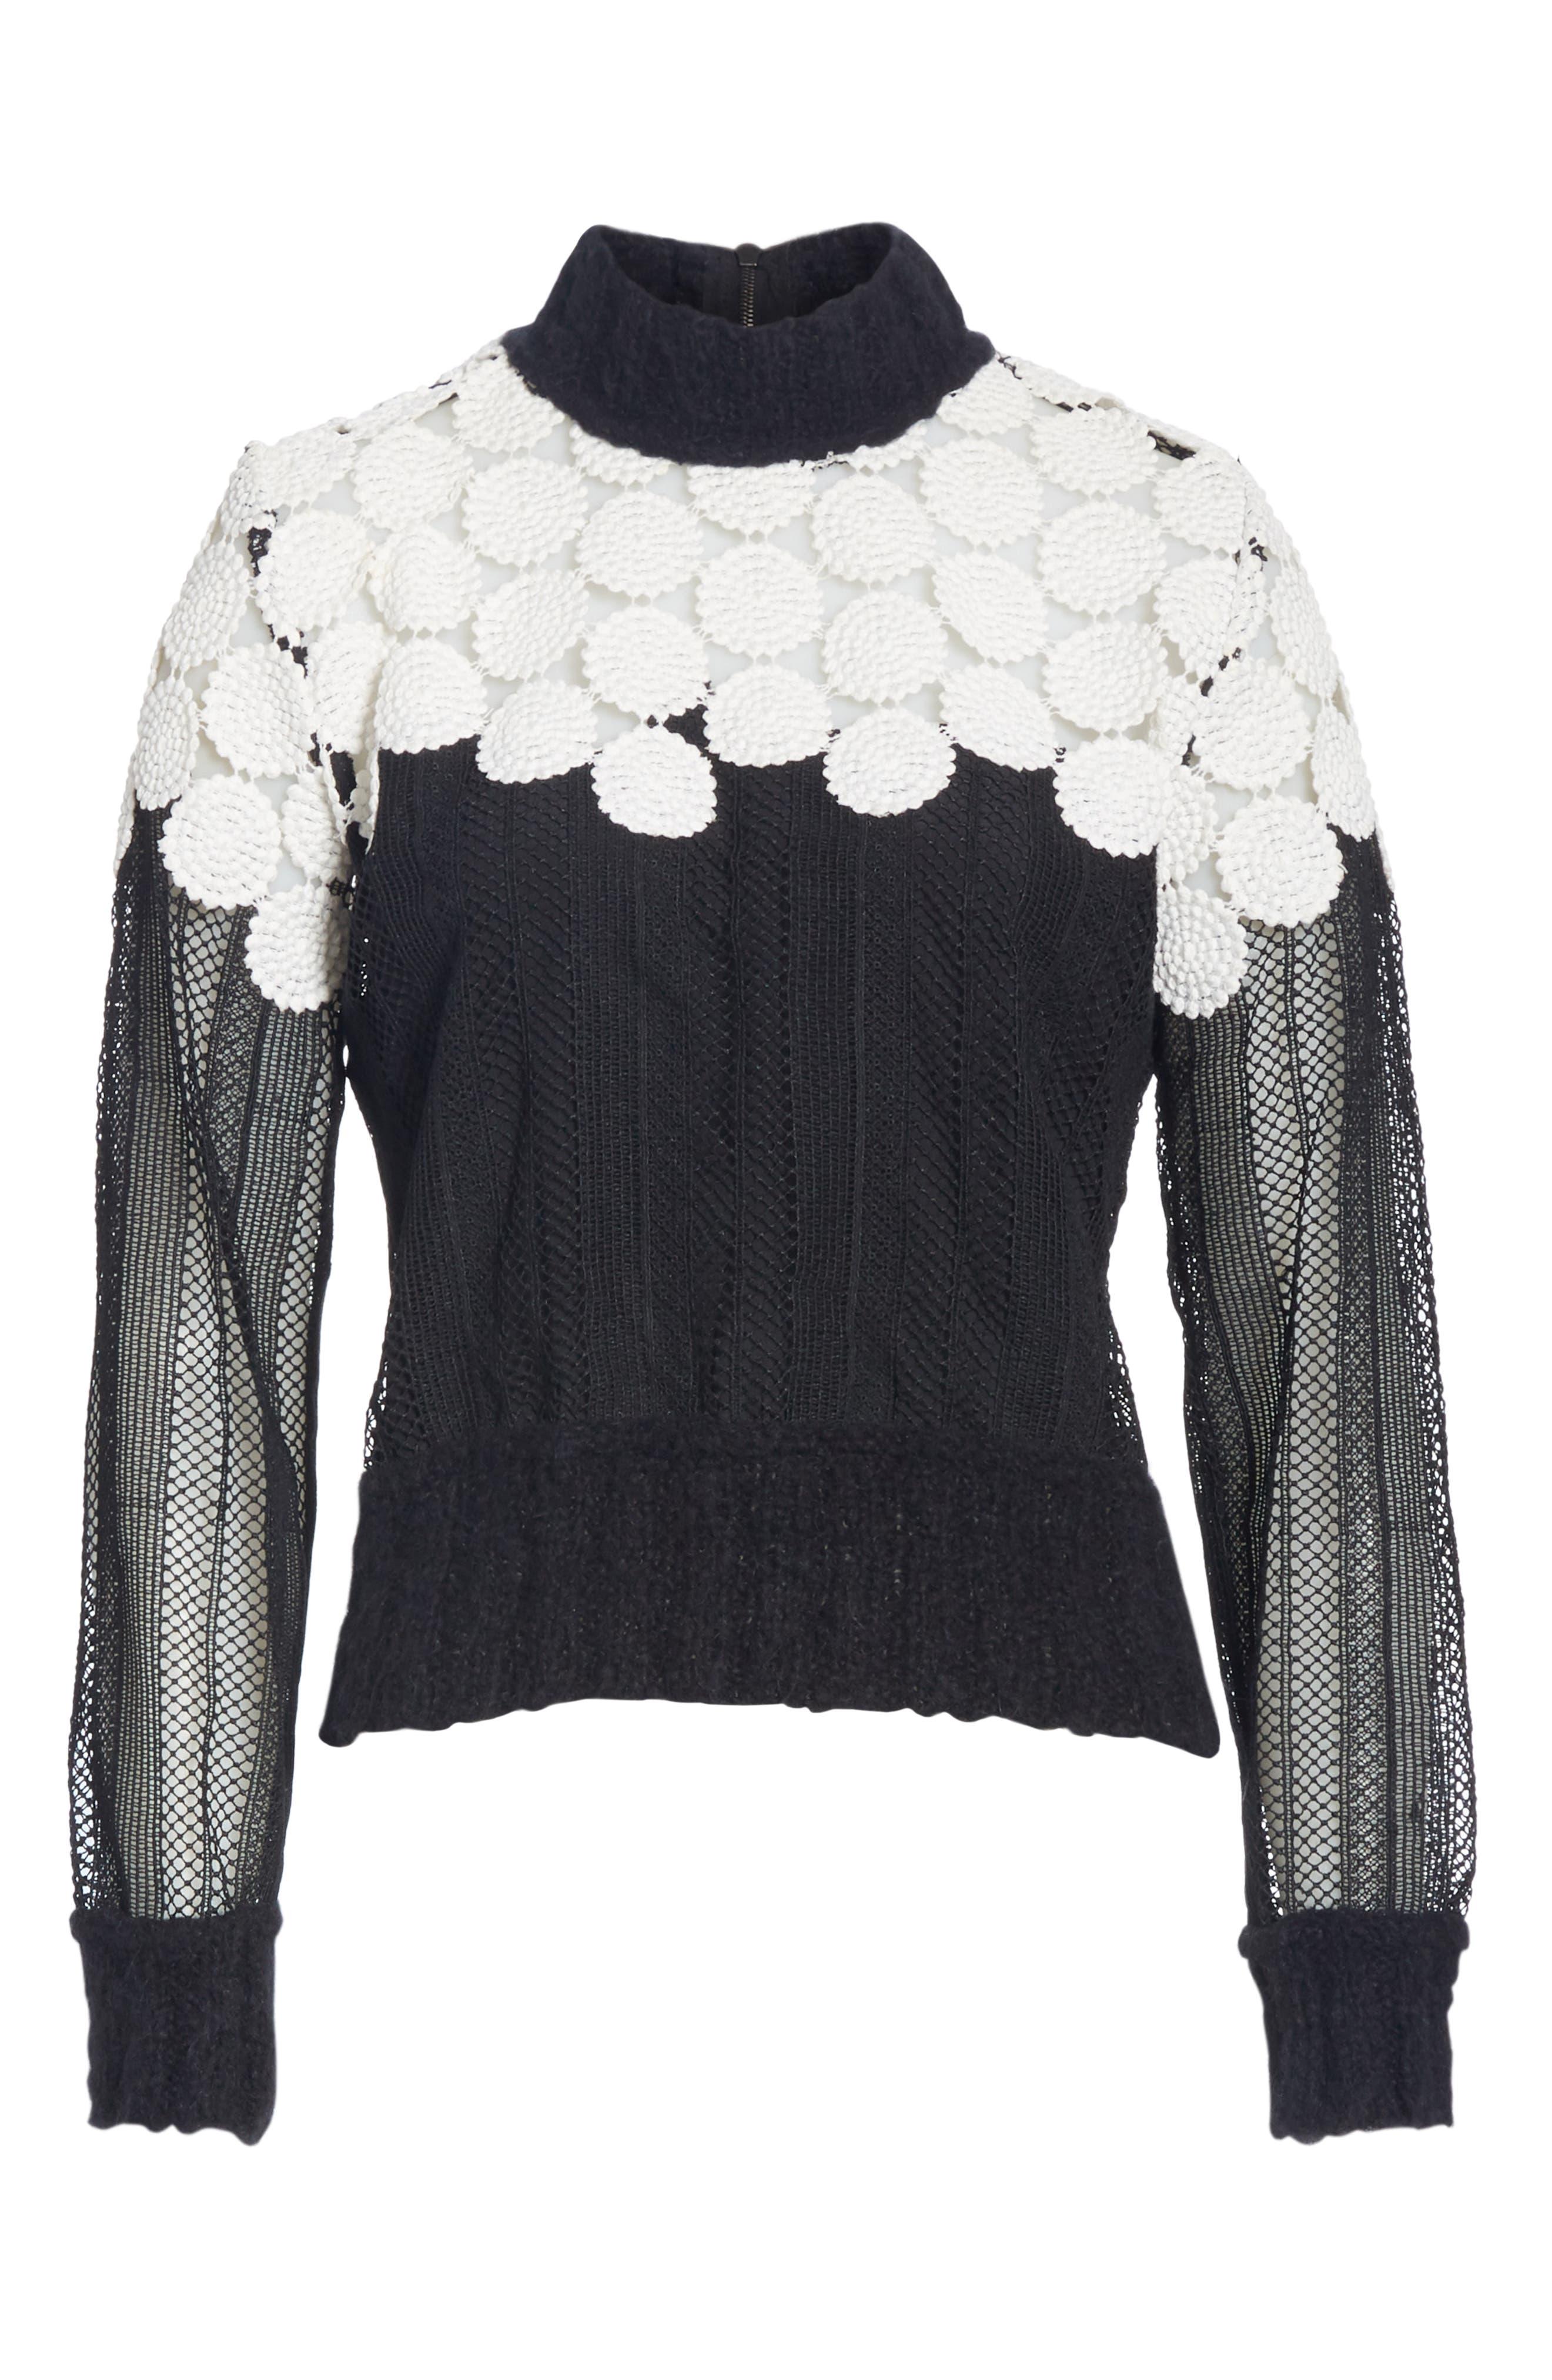 Penelope Mixed Media Sweatshirt,                             Alternate thumbnail 6, color,                             001